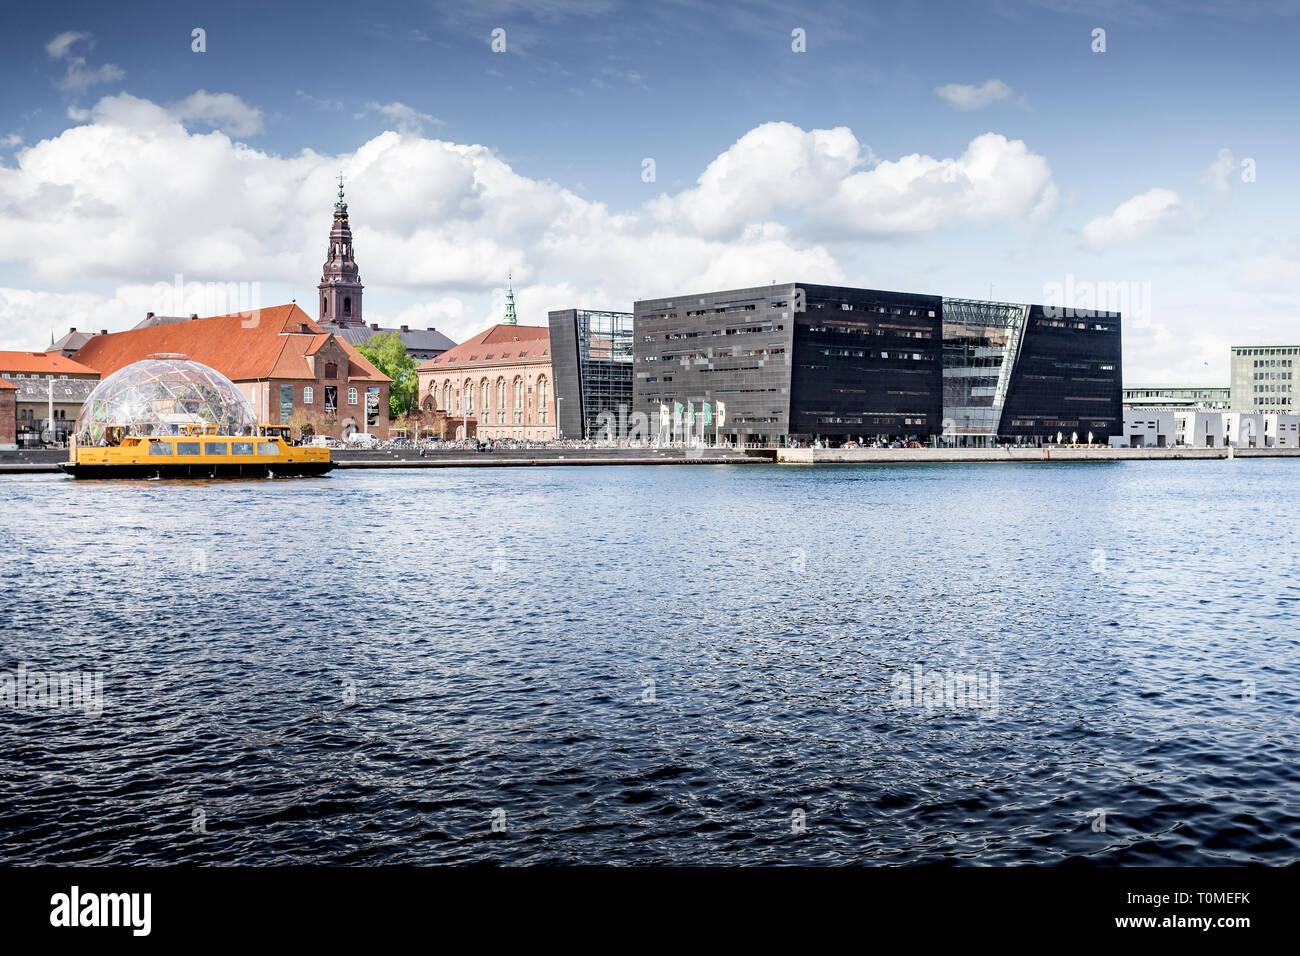 New extension to the Royal Danish Library, called Black Diamond or Den Sorte Diamant on Inderhavn in Slotsholmen, Copenhagen, Denmark Stock Photo